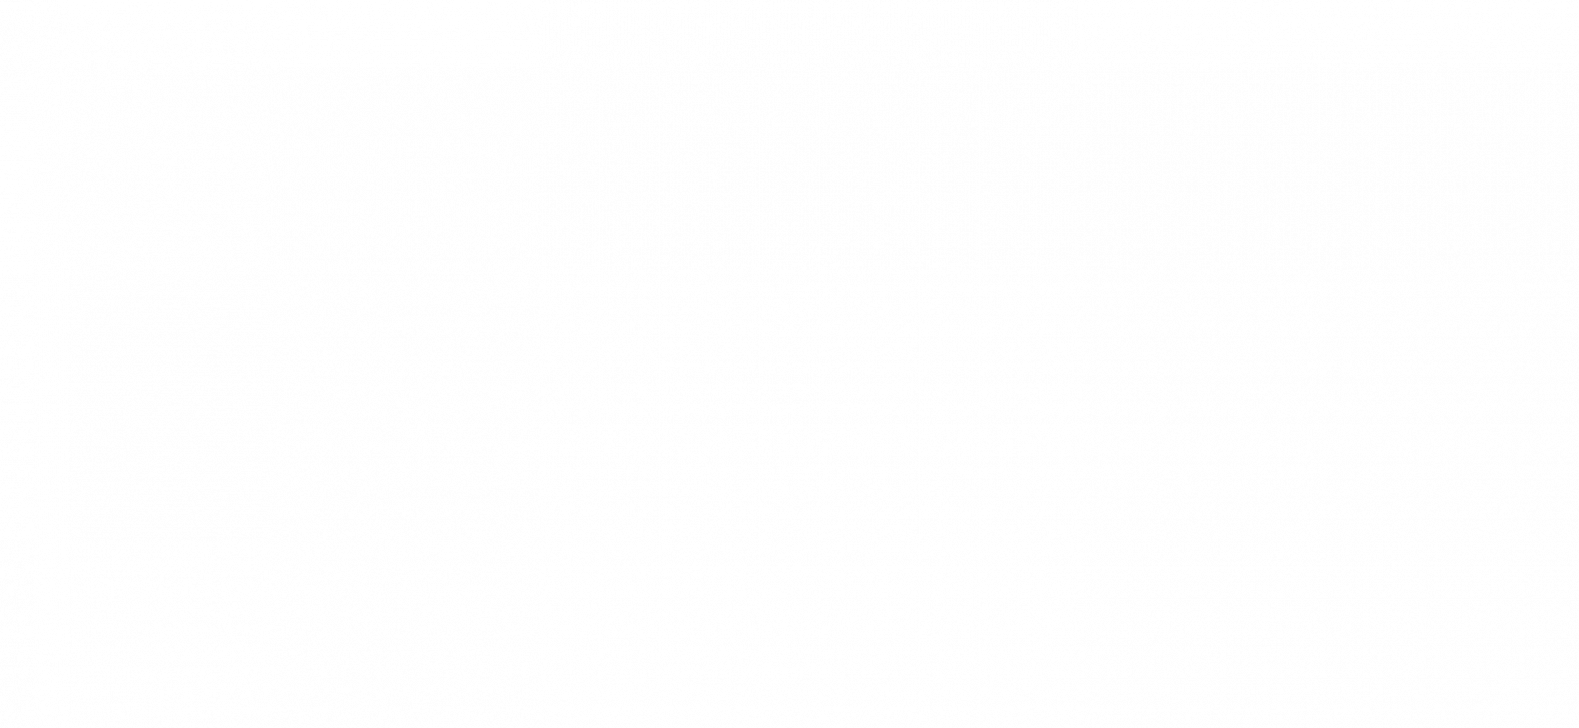 2015-07-07_008